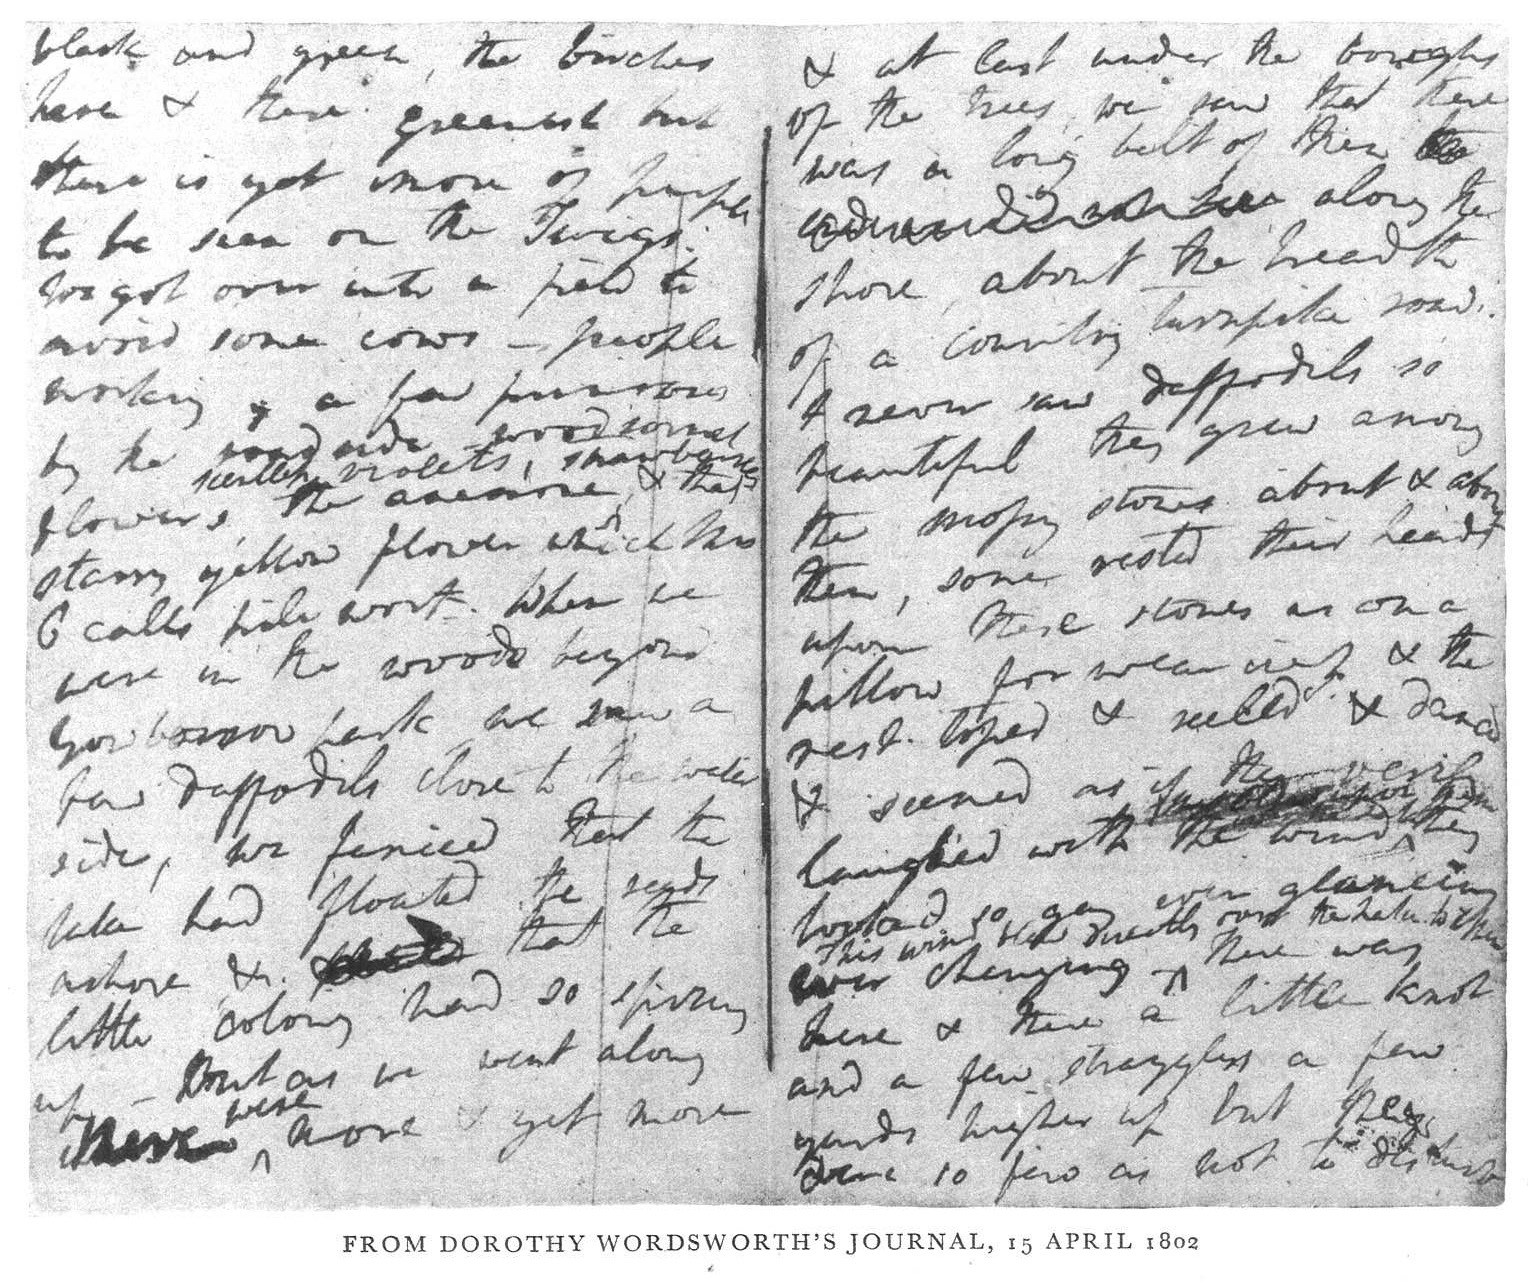 Dorothy Wordsworth's Journal, 15 April 1803 (via Numero Cinq Magazine)